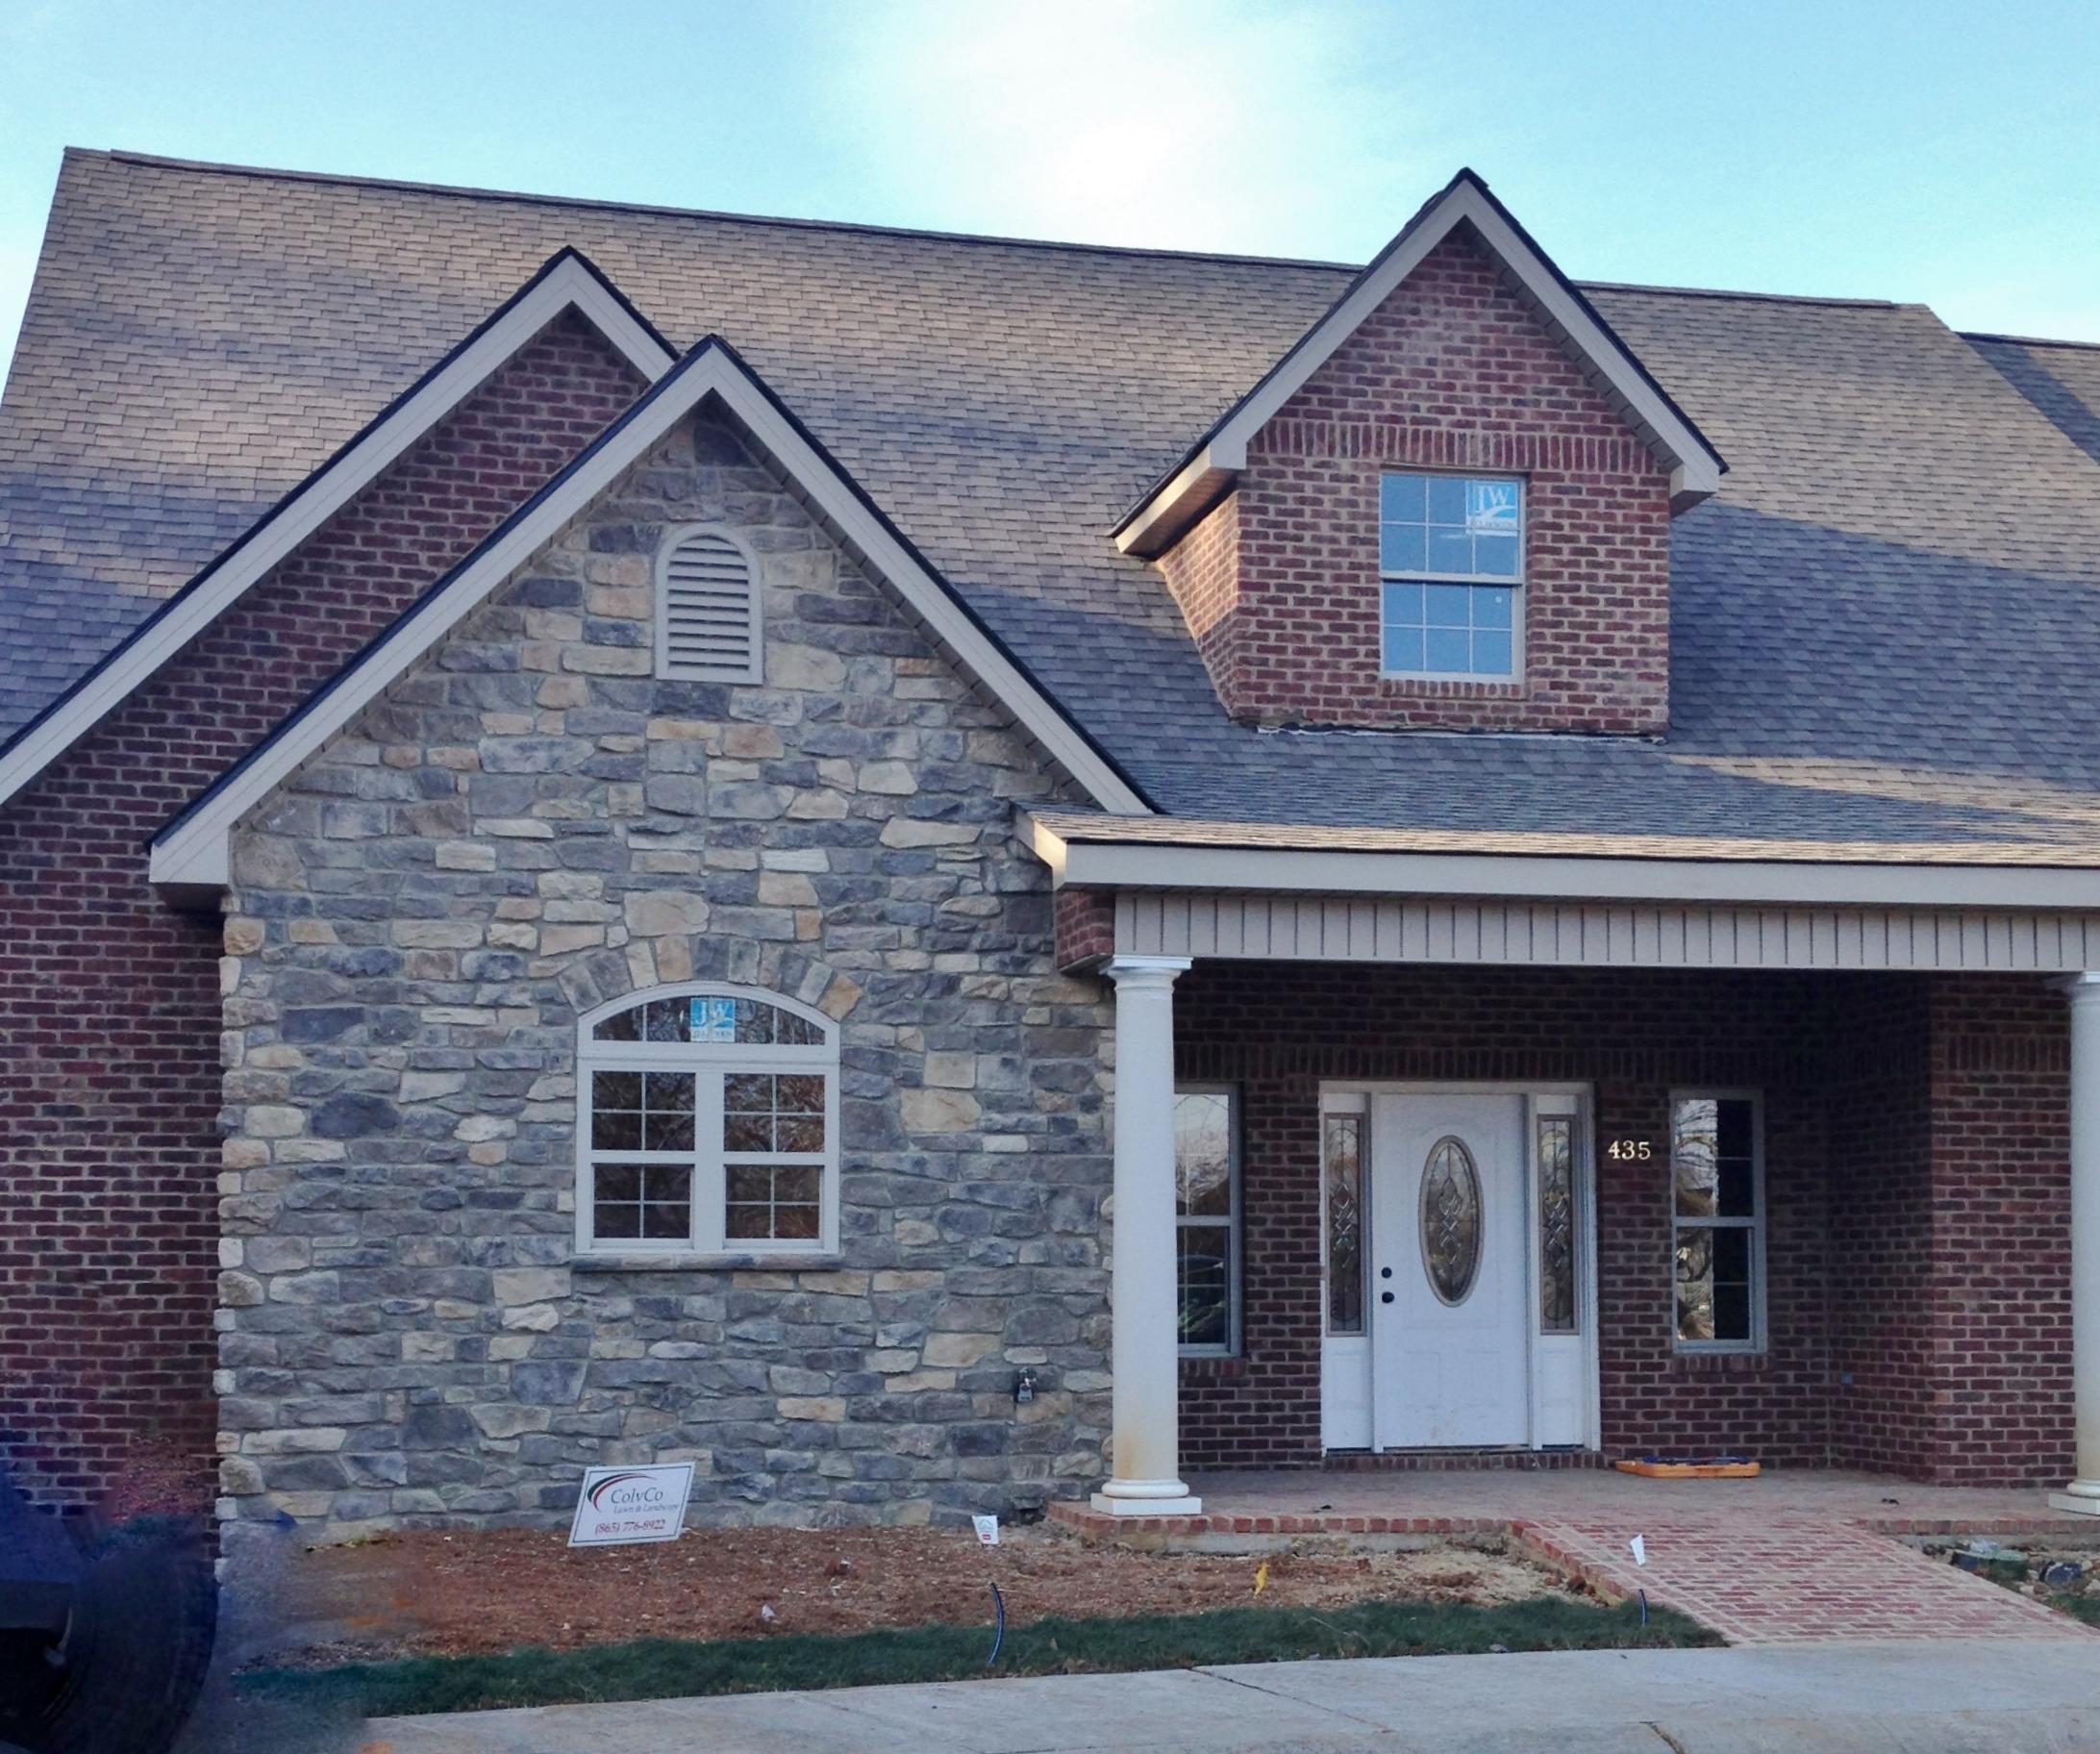 Condominium for Sale at 411 Savannah Village Drive 411 Savannah Village Drive Maryville, Tennessee 37803 United States